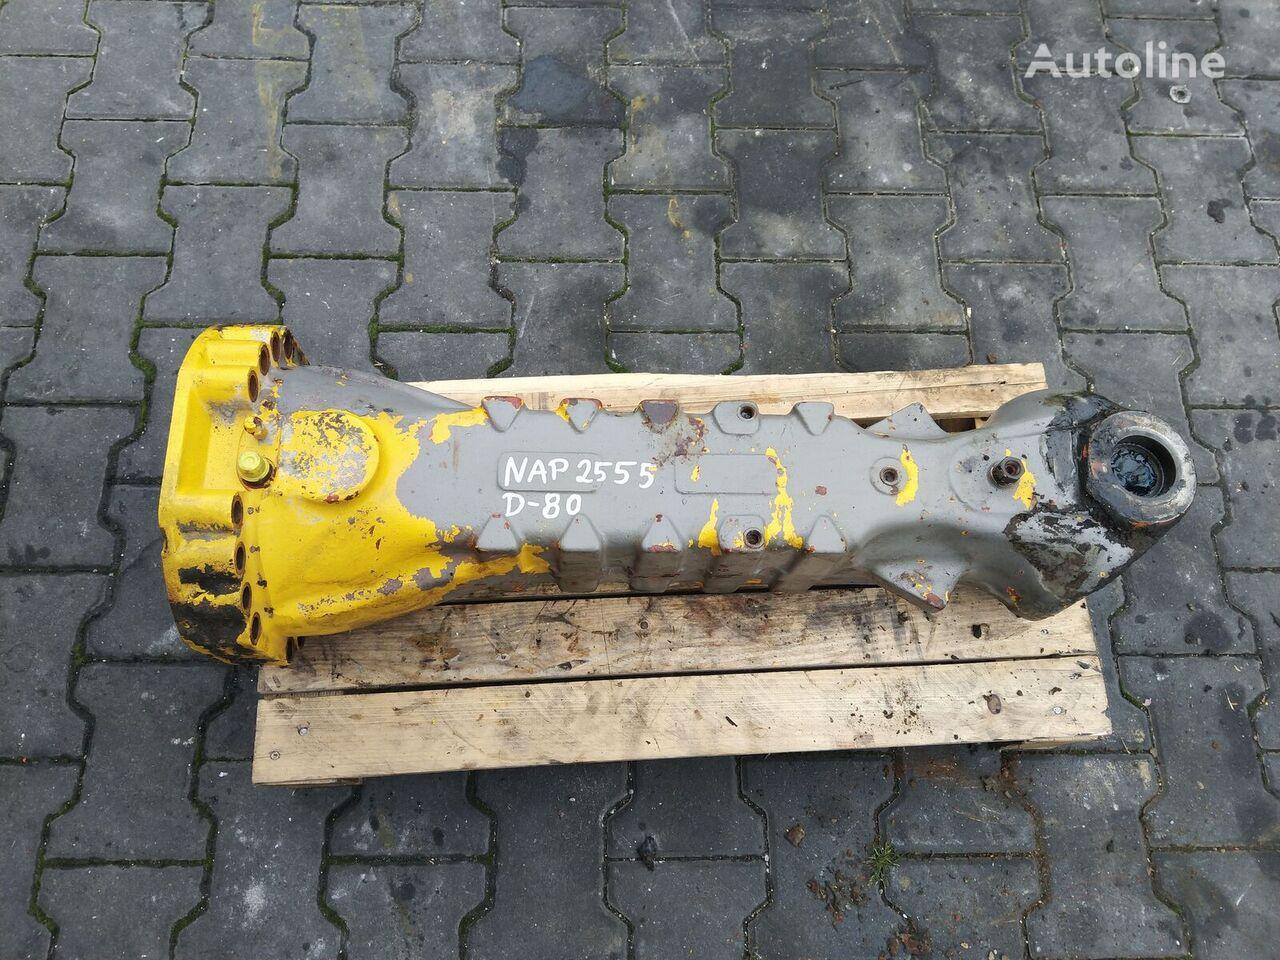 Spicer  Differential mechanism Differentialget Dana (212/193-001) otra pieza de transmisión para MANITOU Dana Spicer 212/193-001 [D-79]  Differential mechanism Differentialgetriebegear Parts Teile cargadora de ruedas